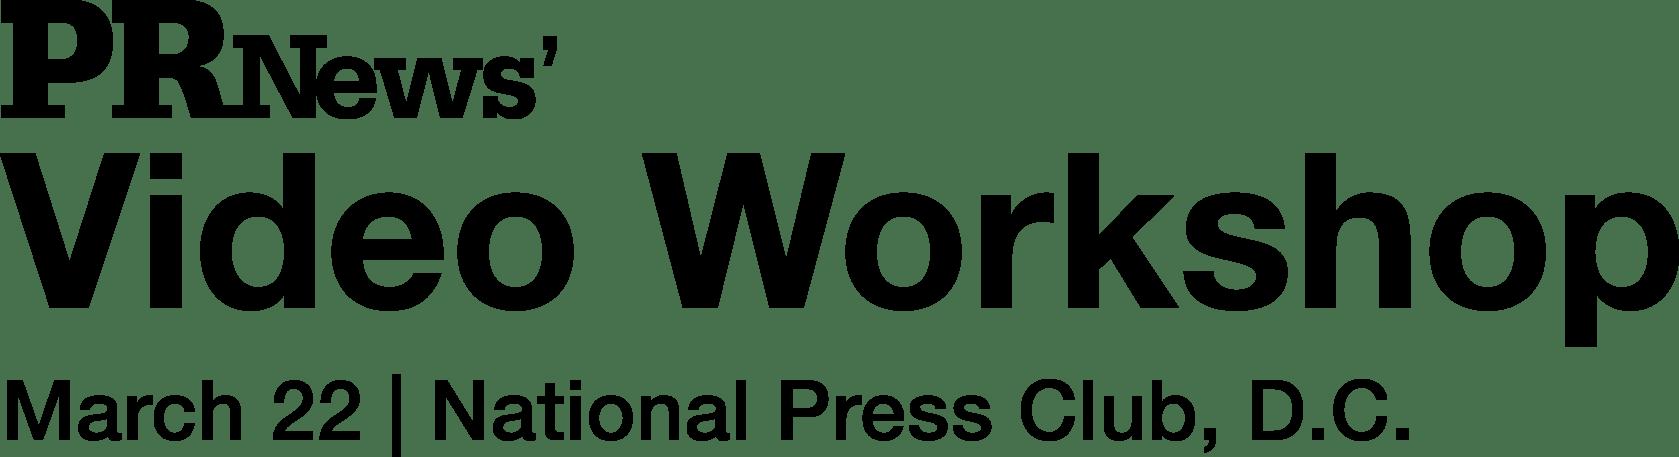 29345_PRN Video Workshop 2017 Logo_Horiz_wDates